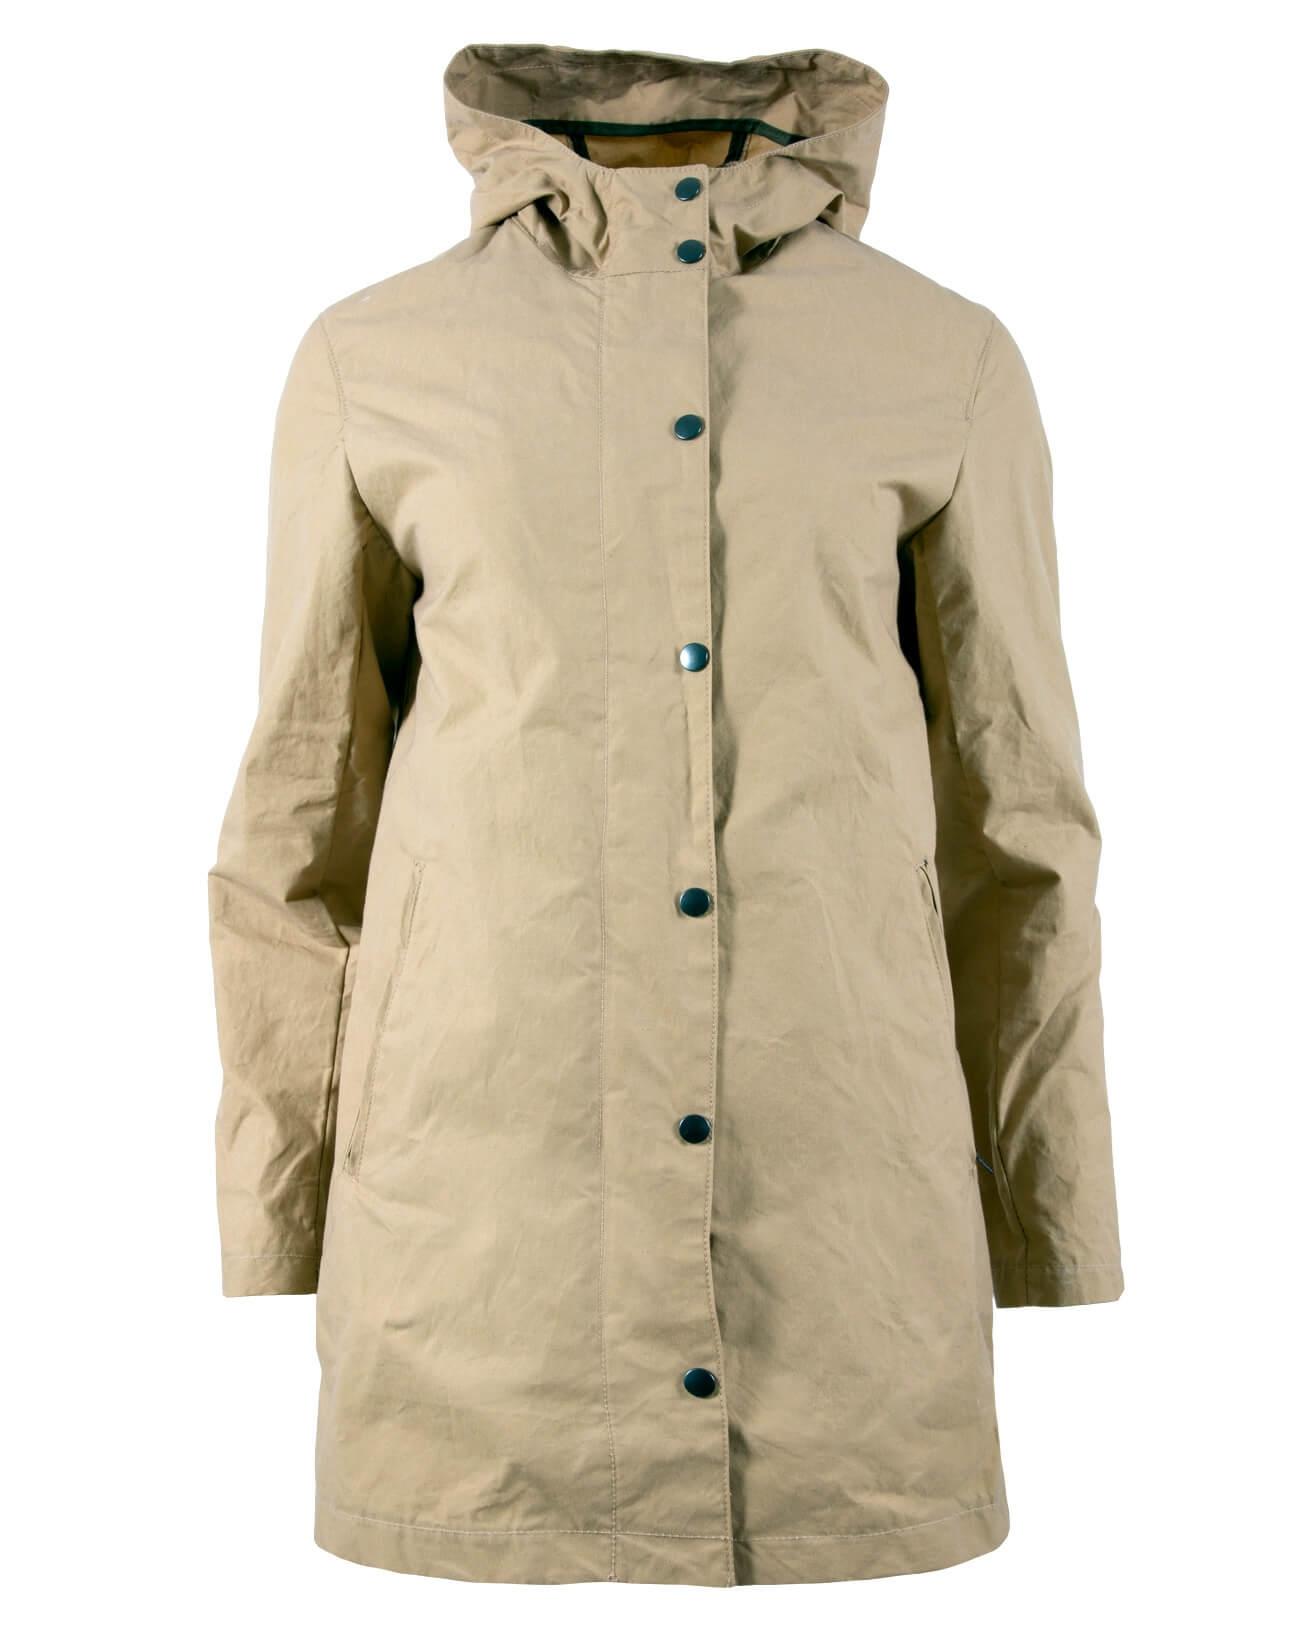 7506_wax-rain-jacket_sand_front_comp.jpg